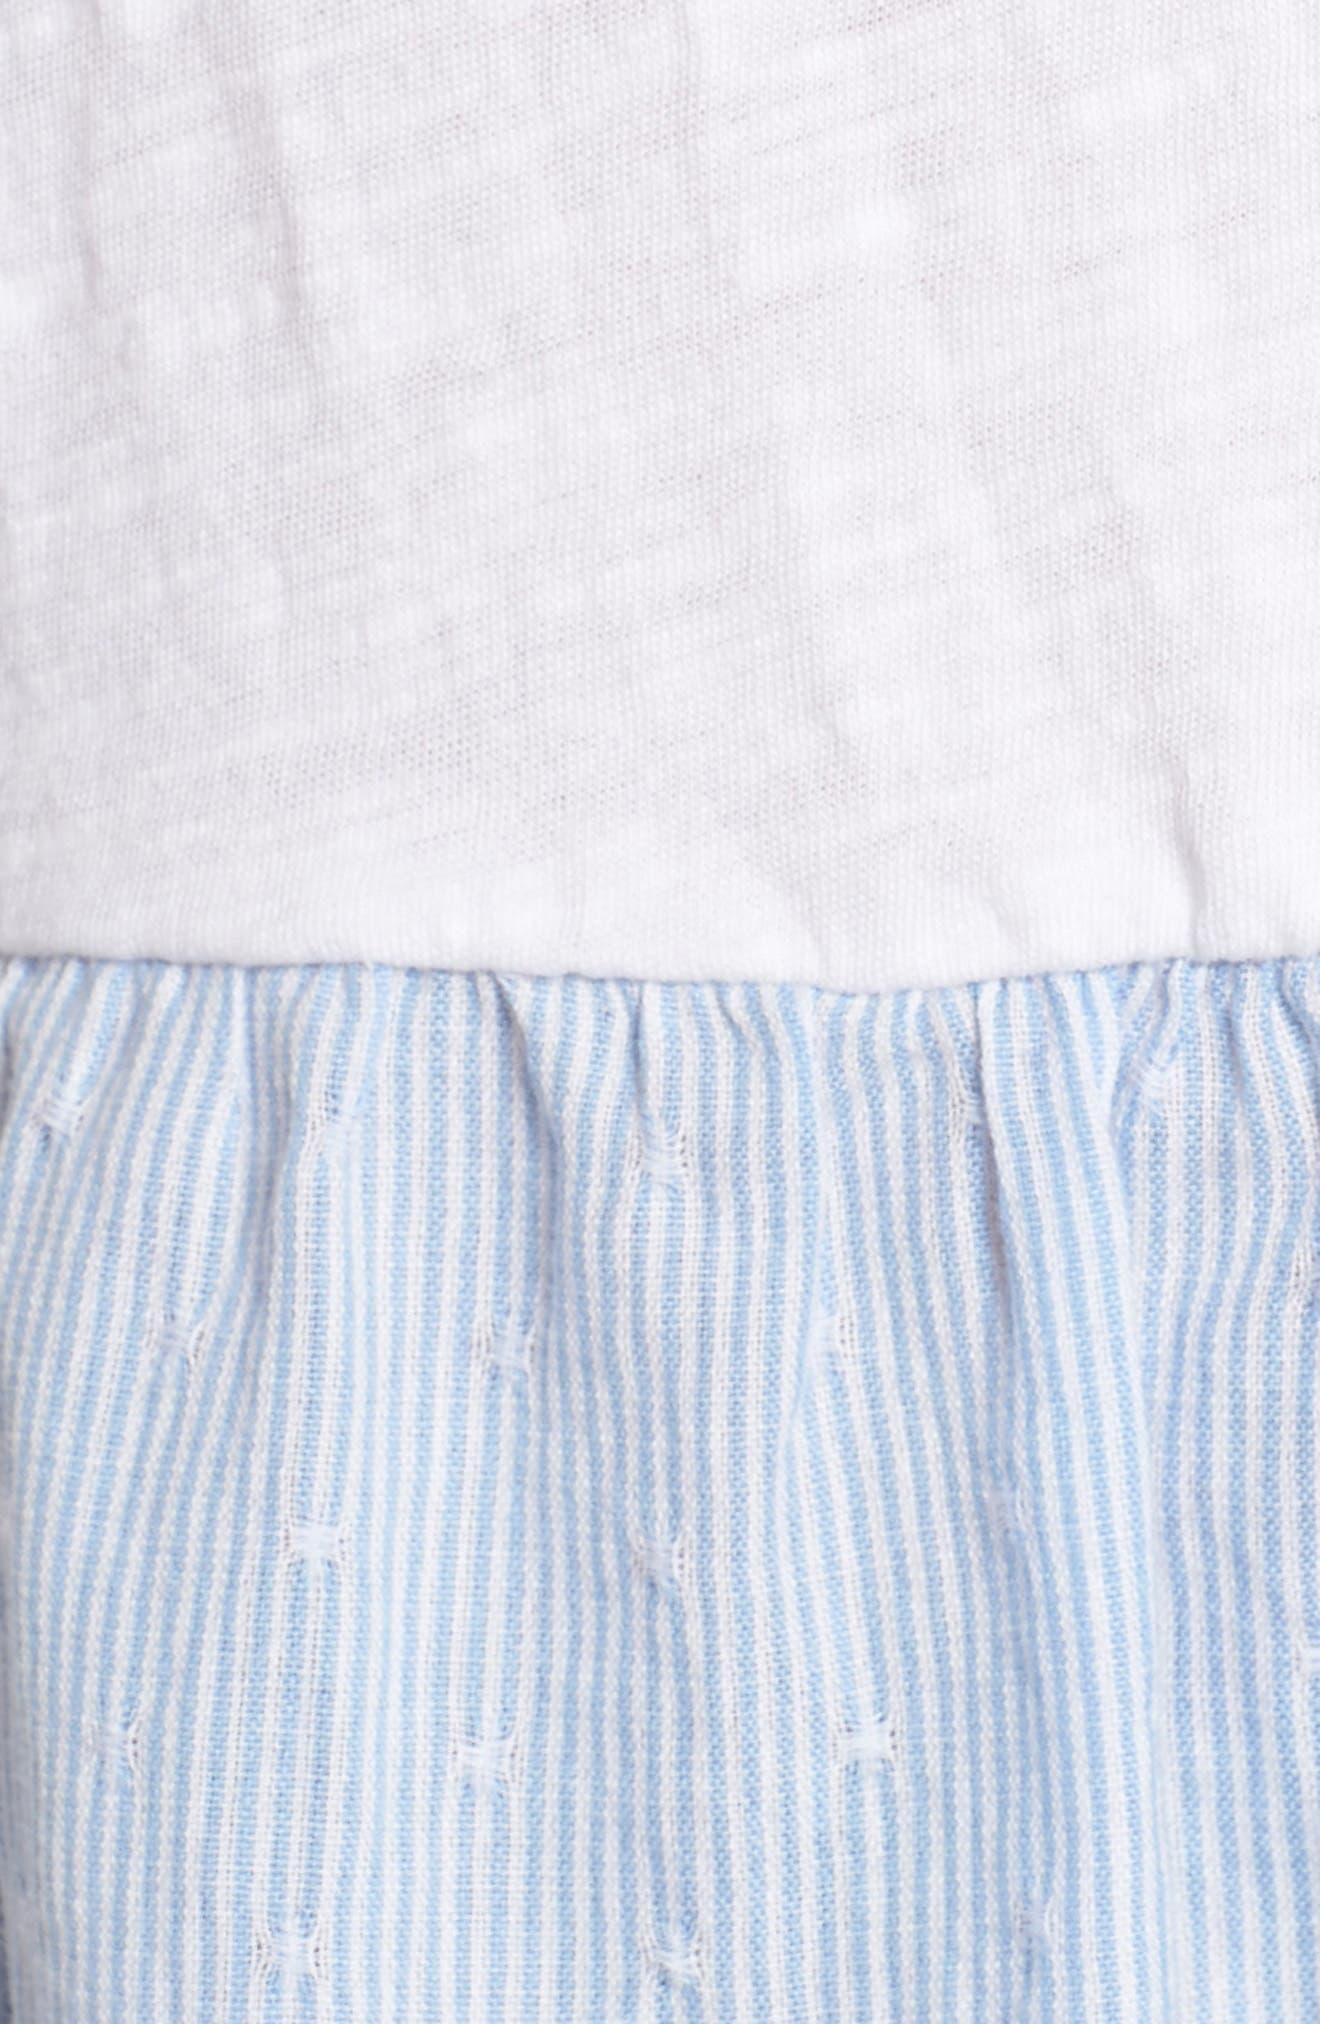 Layered Look Tee,                             Alternate thumbnail 5, color,                             White- Blue White Dobby Stripe